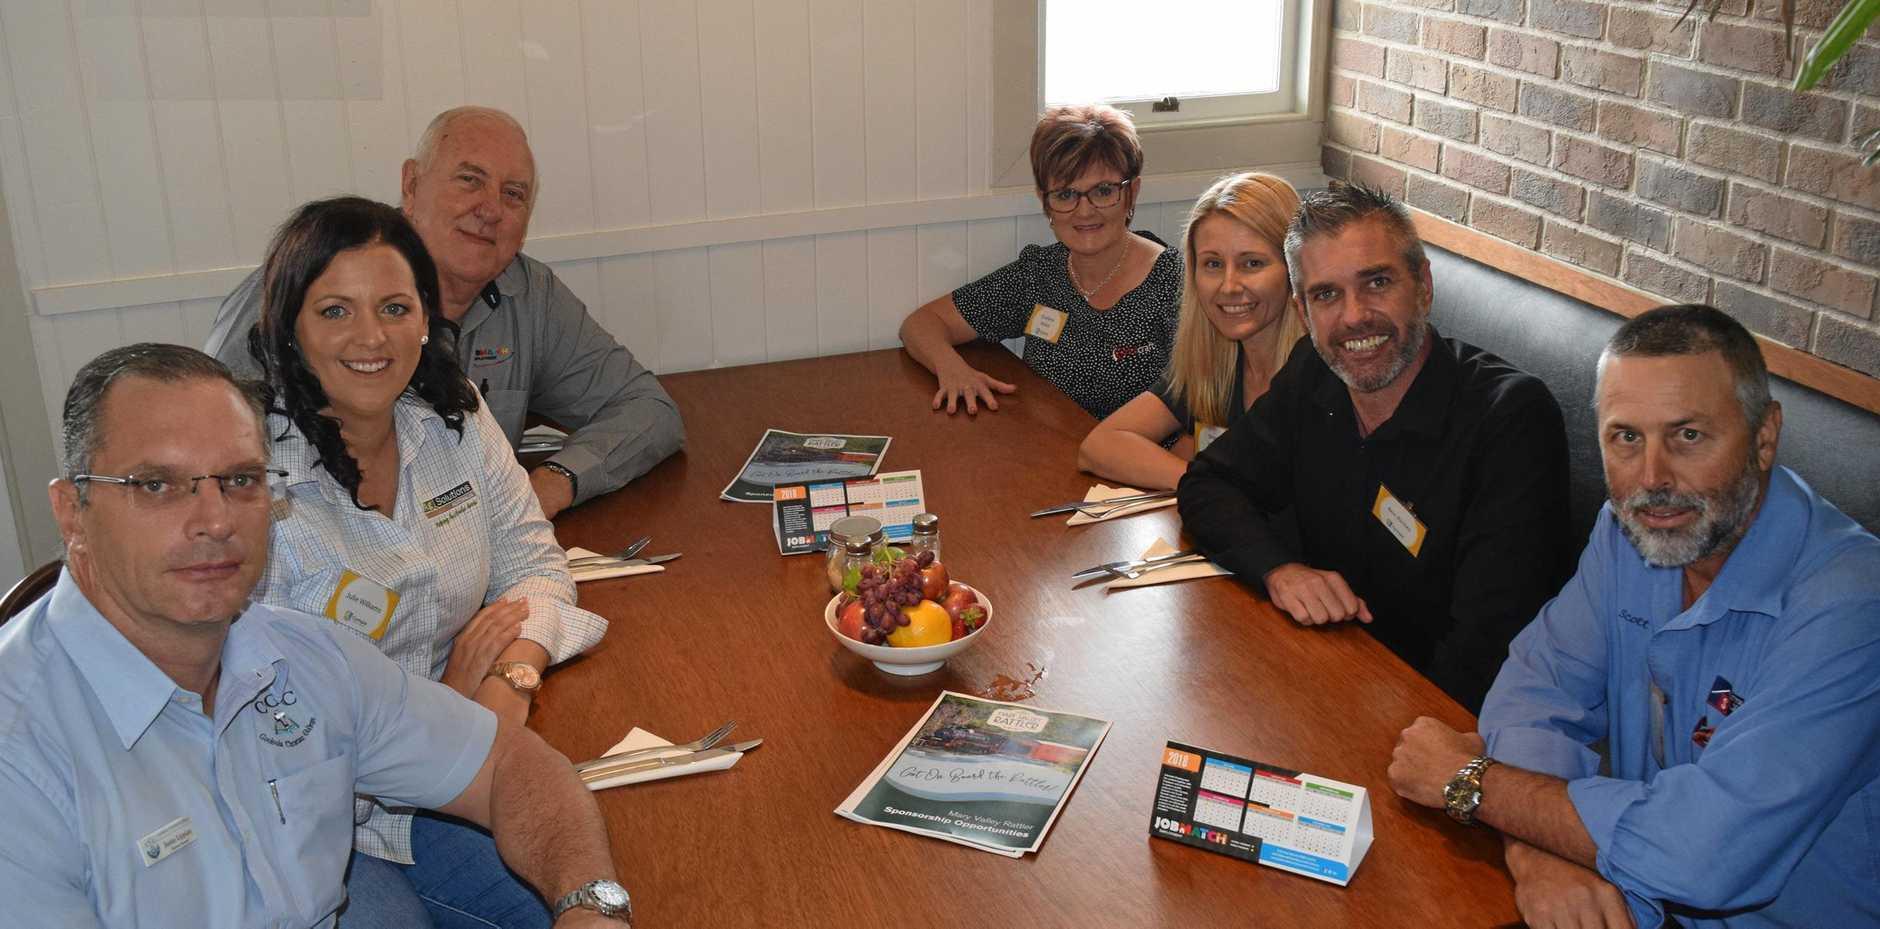 Gympie Chamber of Commerce board members (clockwise from left) Justin Lippiatt, Julie Williams, Garry Davison, Sharlene Makin, Sharon Hansen, Ben Riches and Scott Sutton.